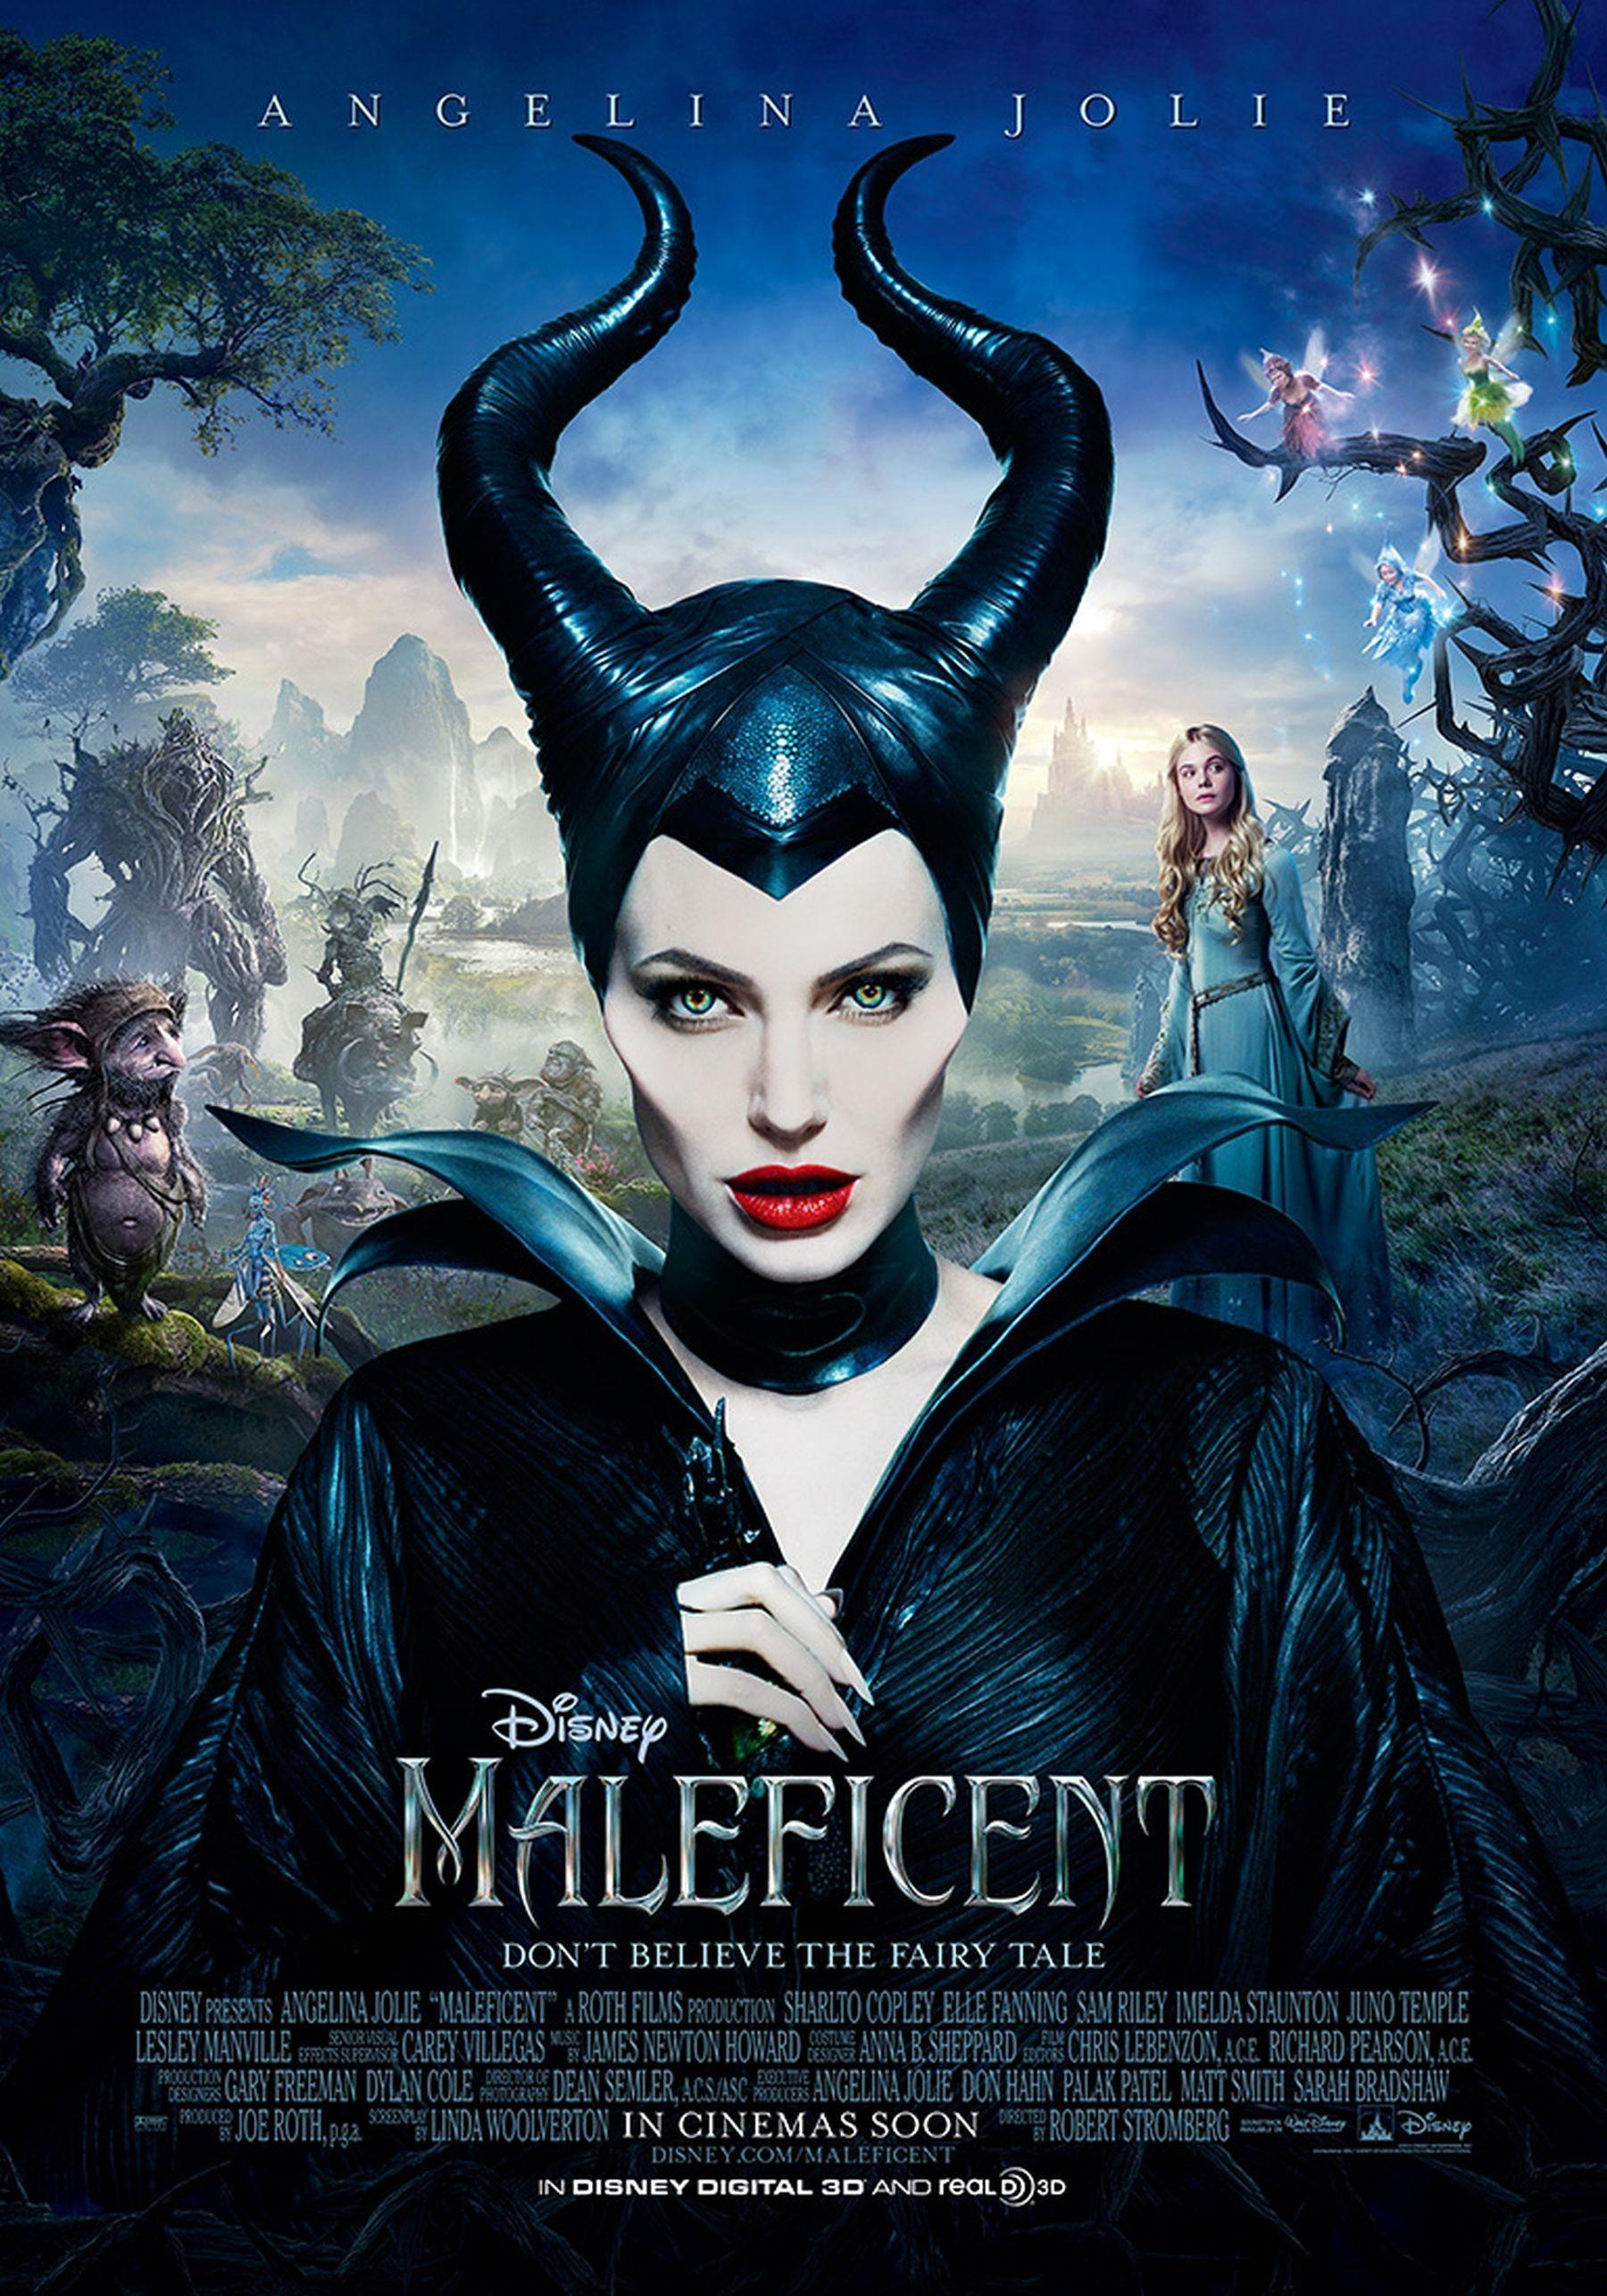 1920x1080 Maleficent Costume Pattern